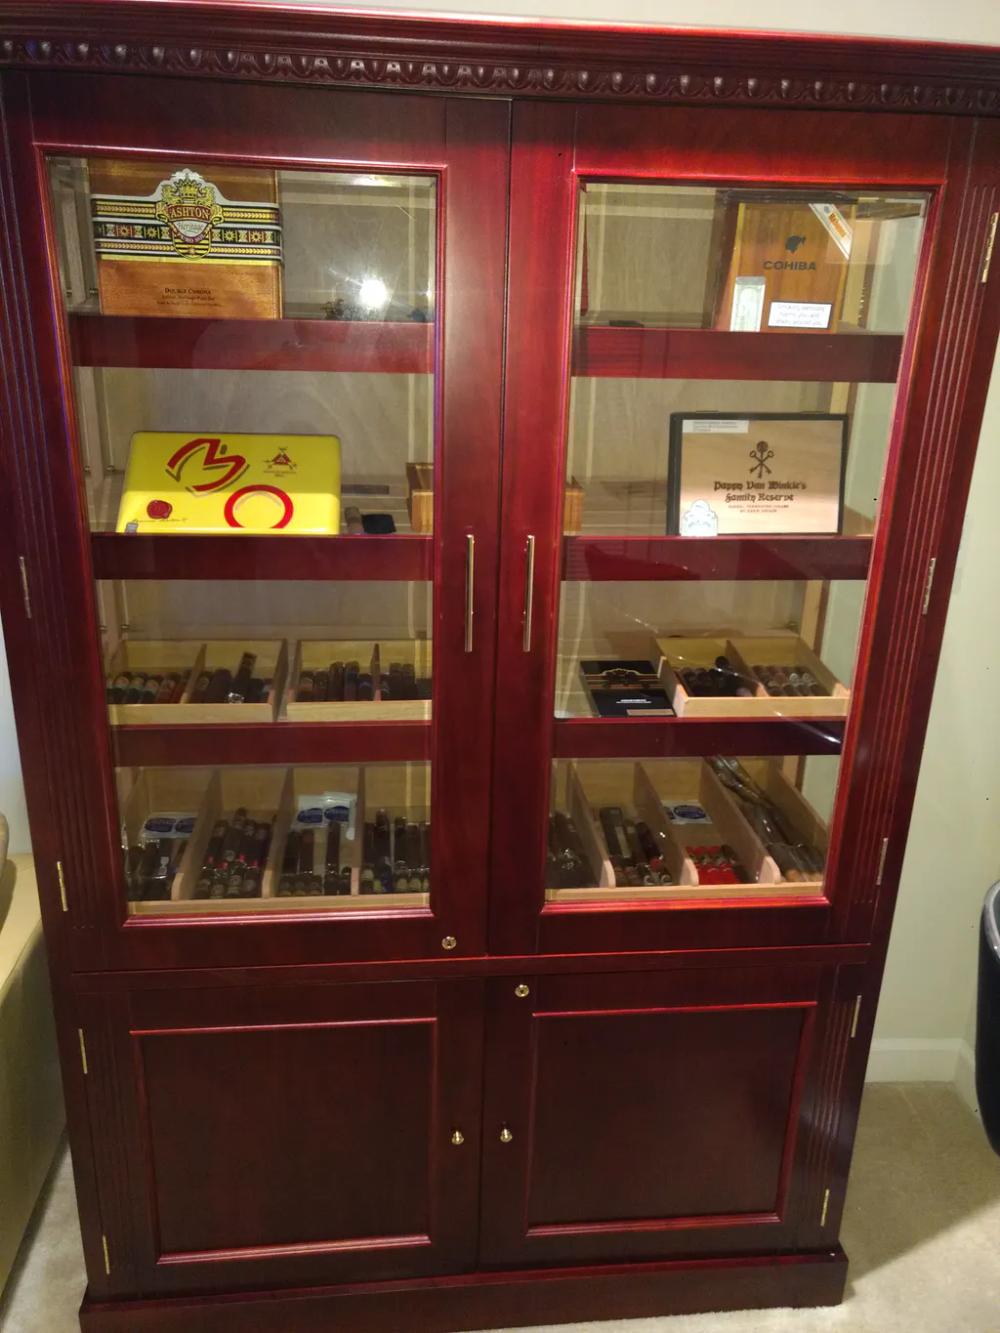 Saint Regis Humidor Cabinet Prestige Imports 4000 Cigar In 2020 Humidor Cabinet Humidor Cigar Humidor Cabinet